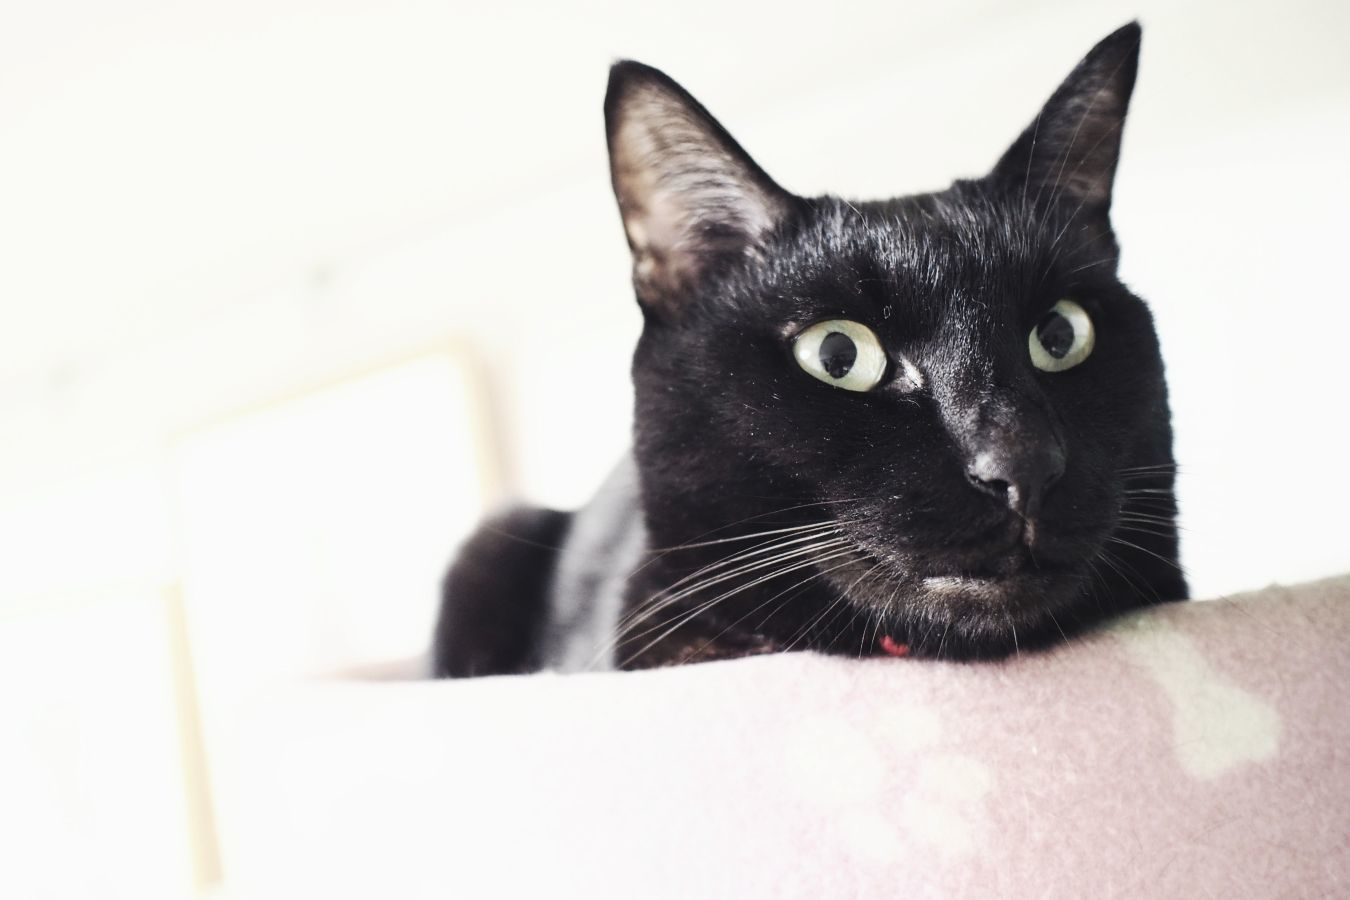 【Photo】ハロウィンは、黒猫_b0008655_19412099.jpg